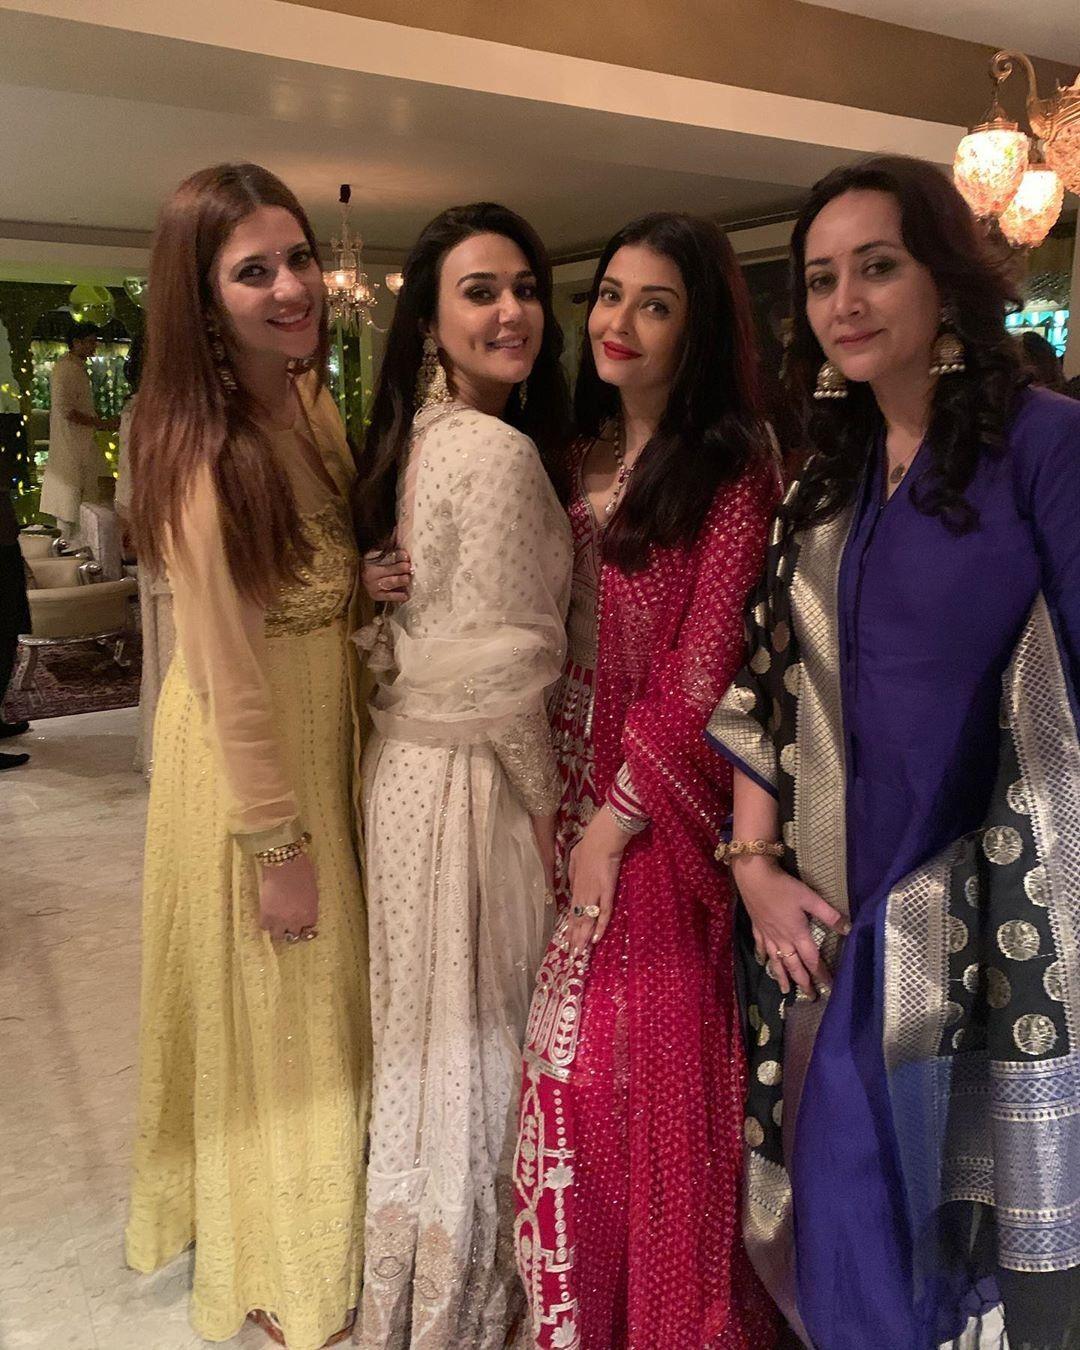 Aishwarya Rai Preity Zinta Aishwarya Rai Photo Sister Poses